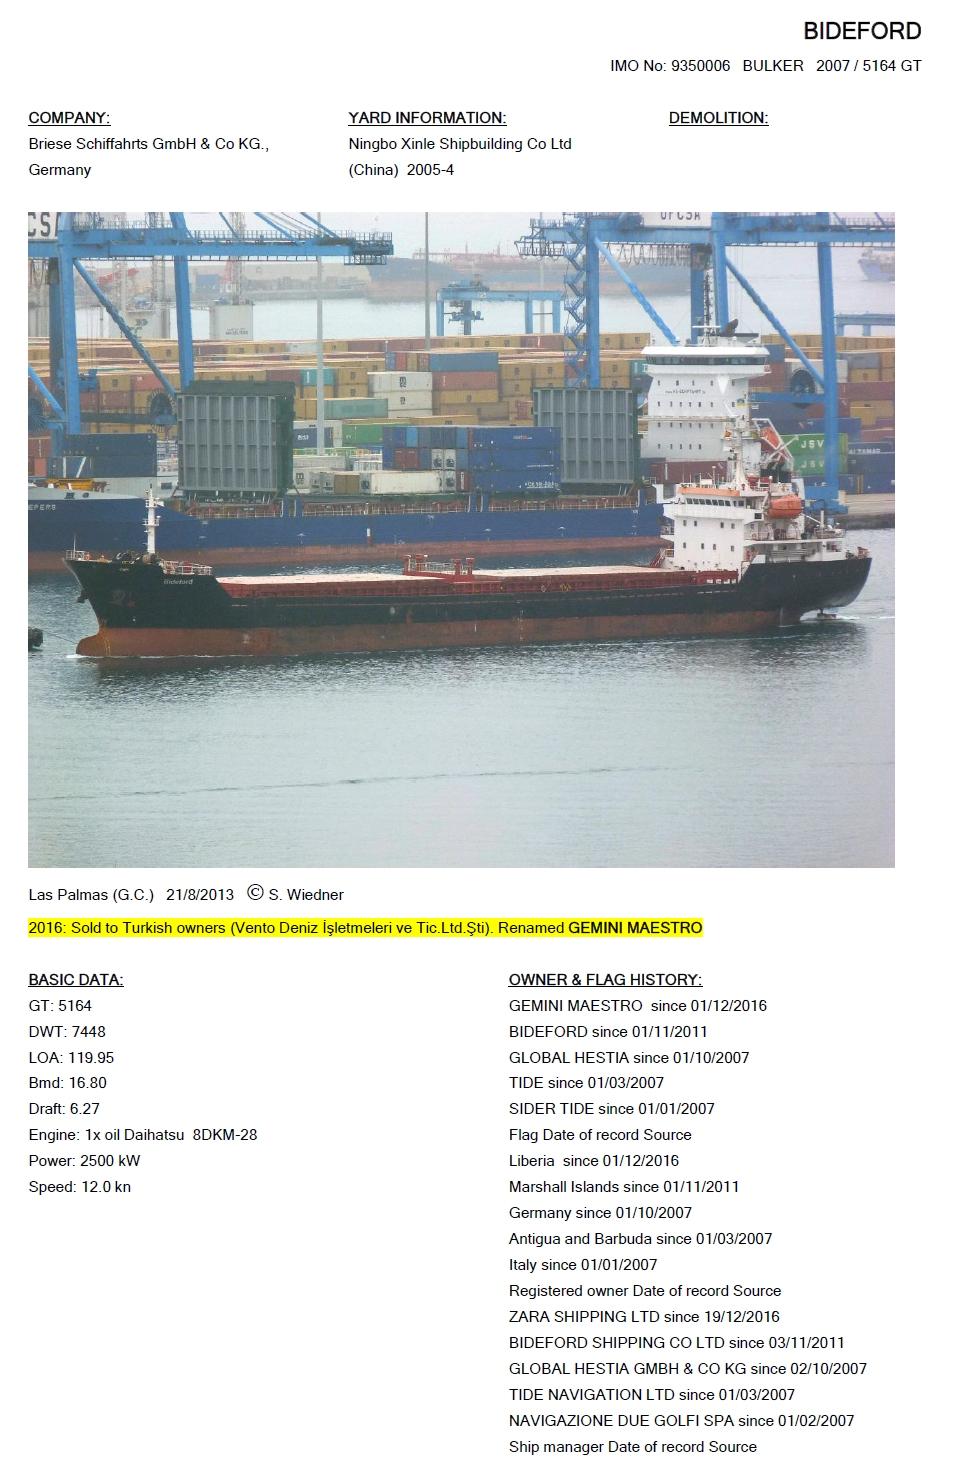 Cargo Vessels International Non Commercial Shipping Research 282500 Bideford Imo 9350006 2007 5164 Gt 7448 Dwt Ningbo Xinle 2005 4 Daihatsu 8dkm 28 2500 Kw Gemini Maestro 2016 2011 16 Global